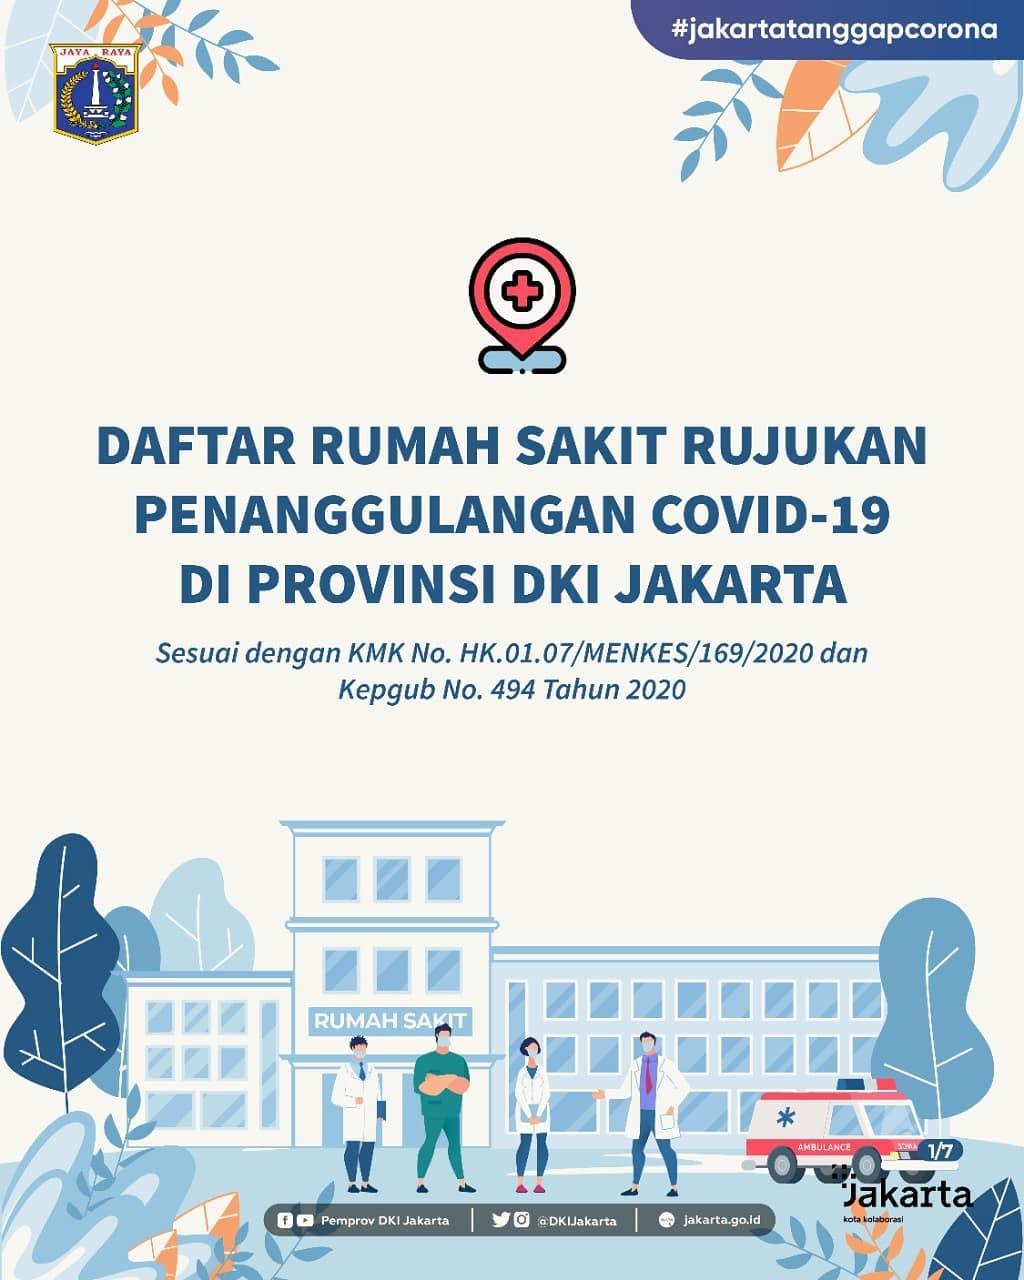 DAFTAR RUMAH SAKIT RUJUKAN PENANGGULANGAN COVID-19 DI PROVINSI DKI JAKARTA-SLIDE-1